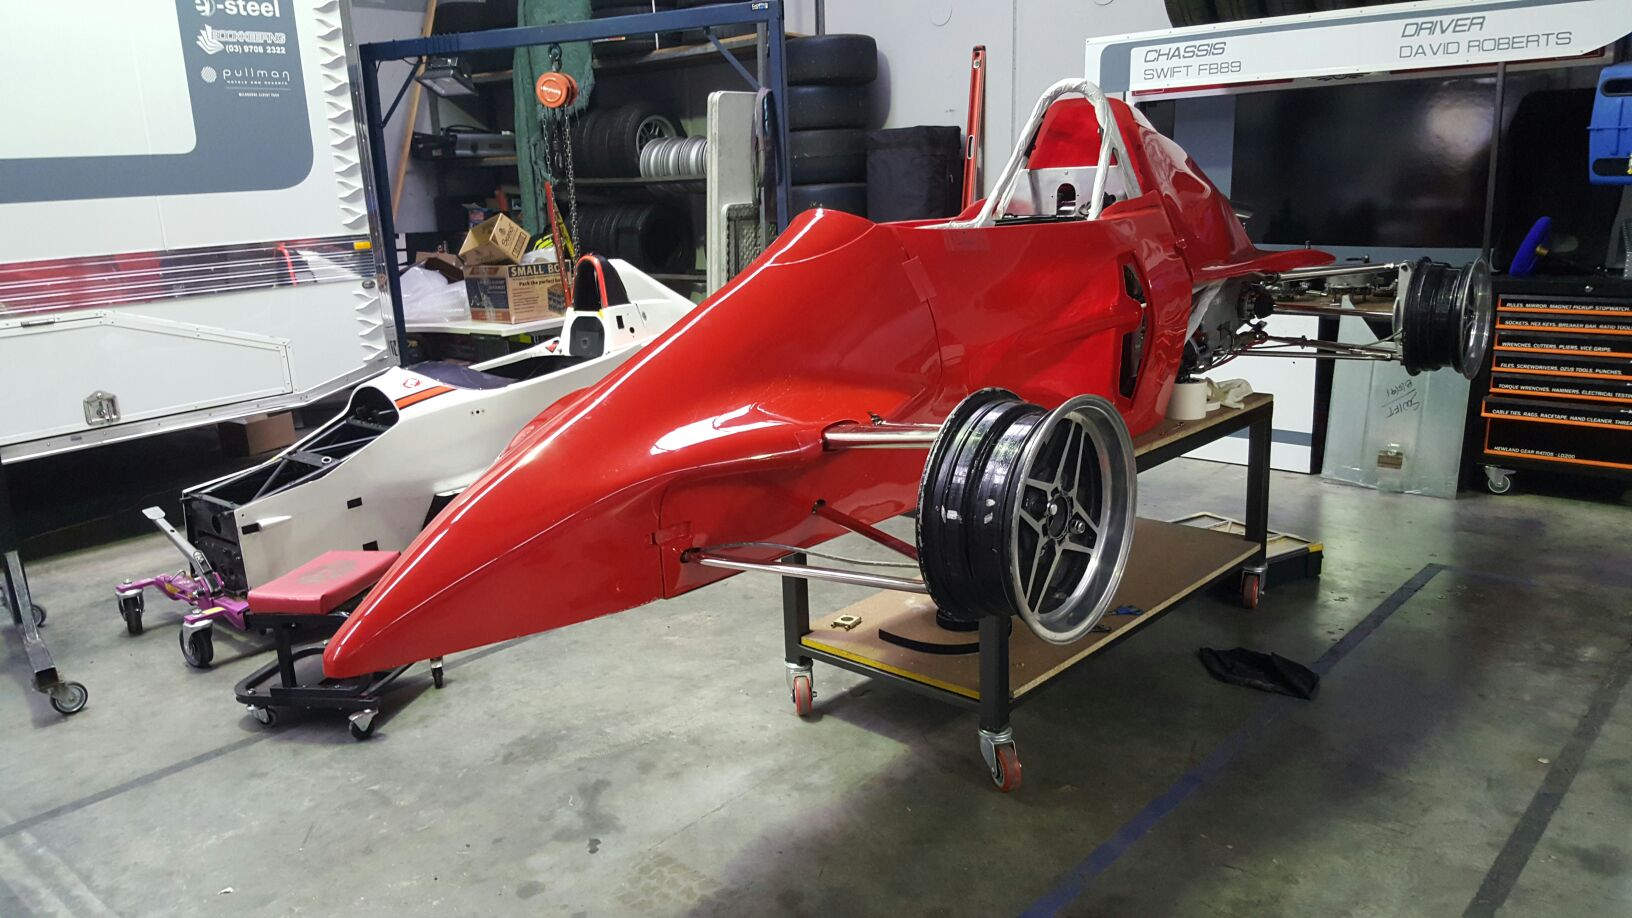 I Bought a Race Car-image-jpeg